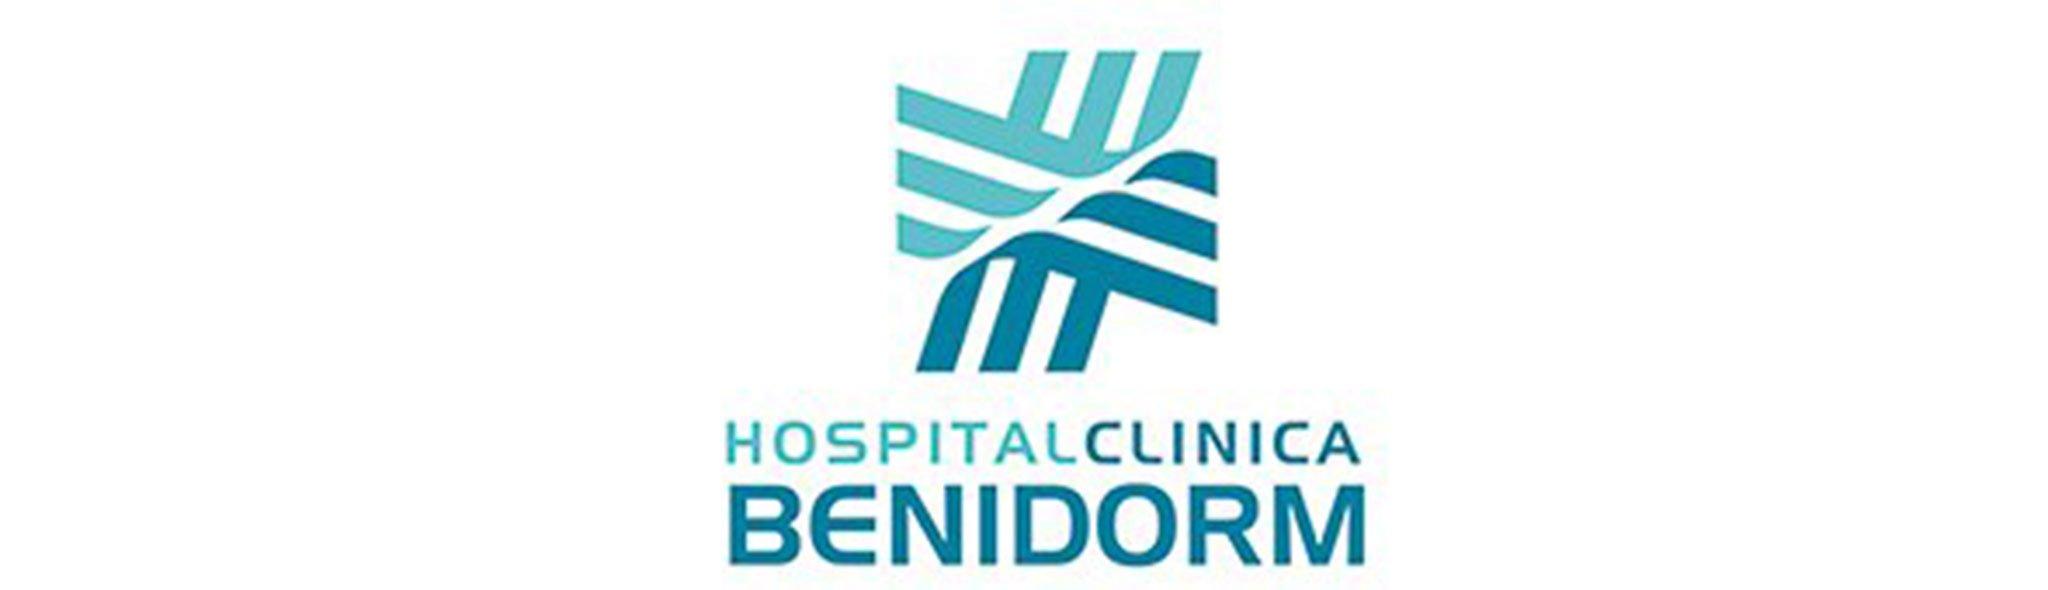 Logotipo de Hospital Clínica Benidorm